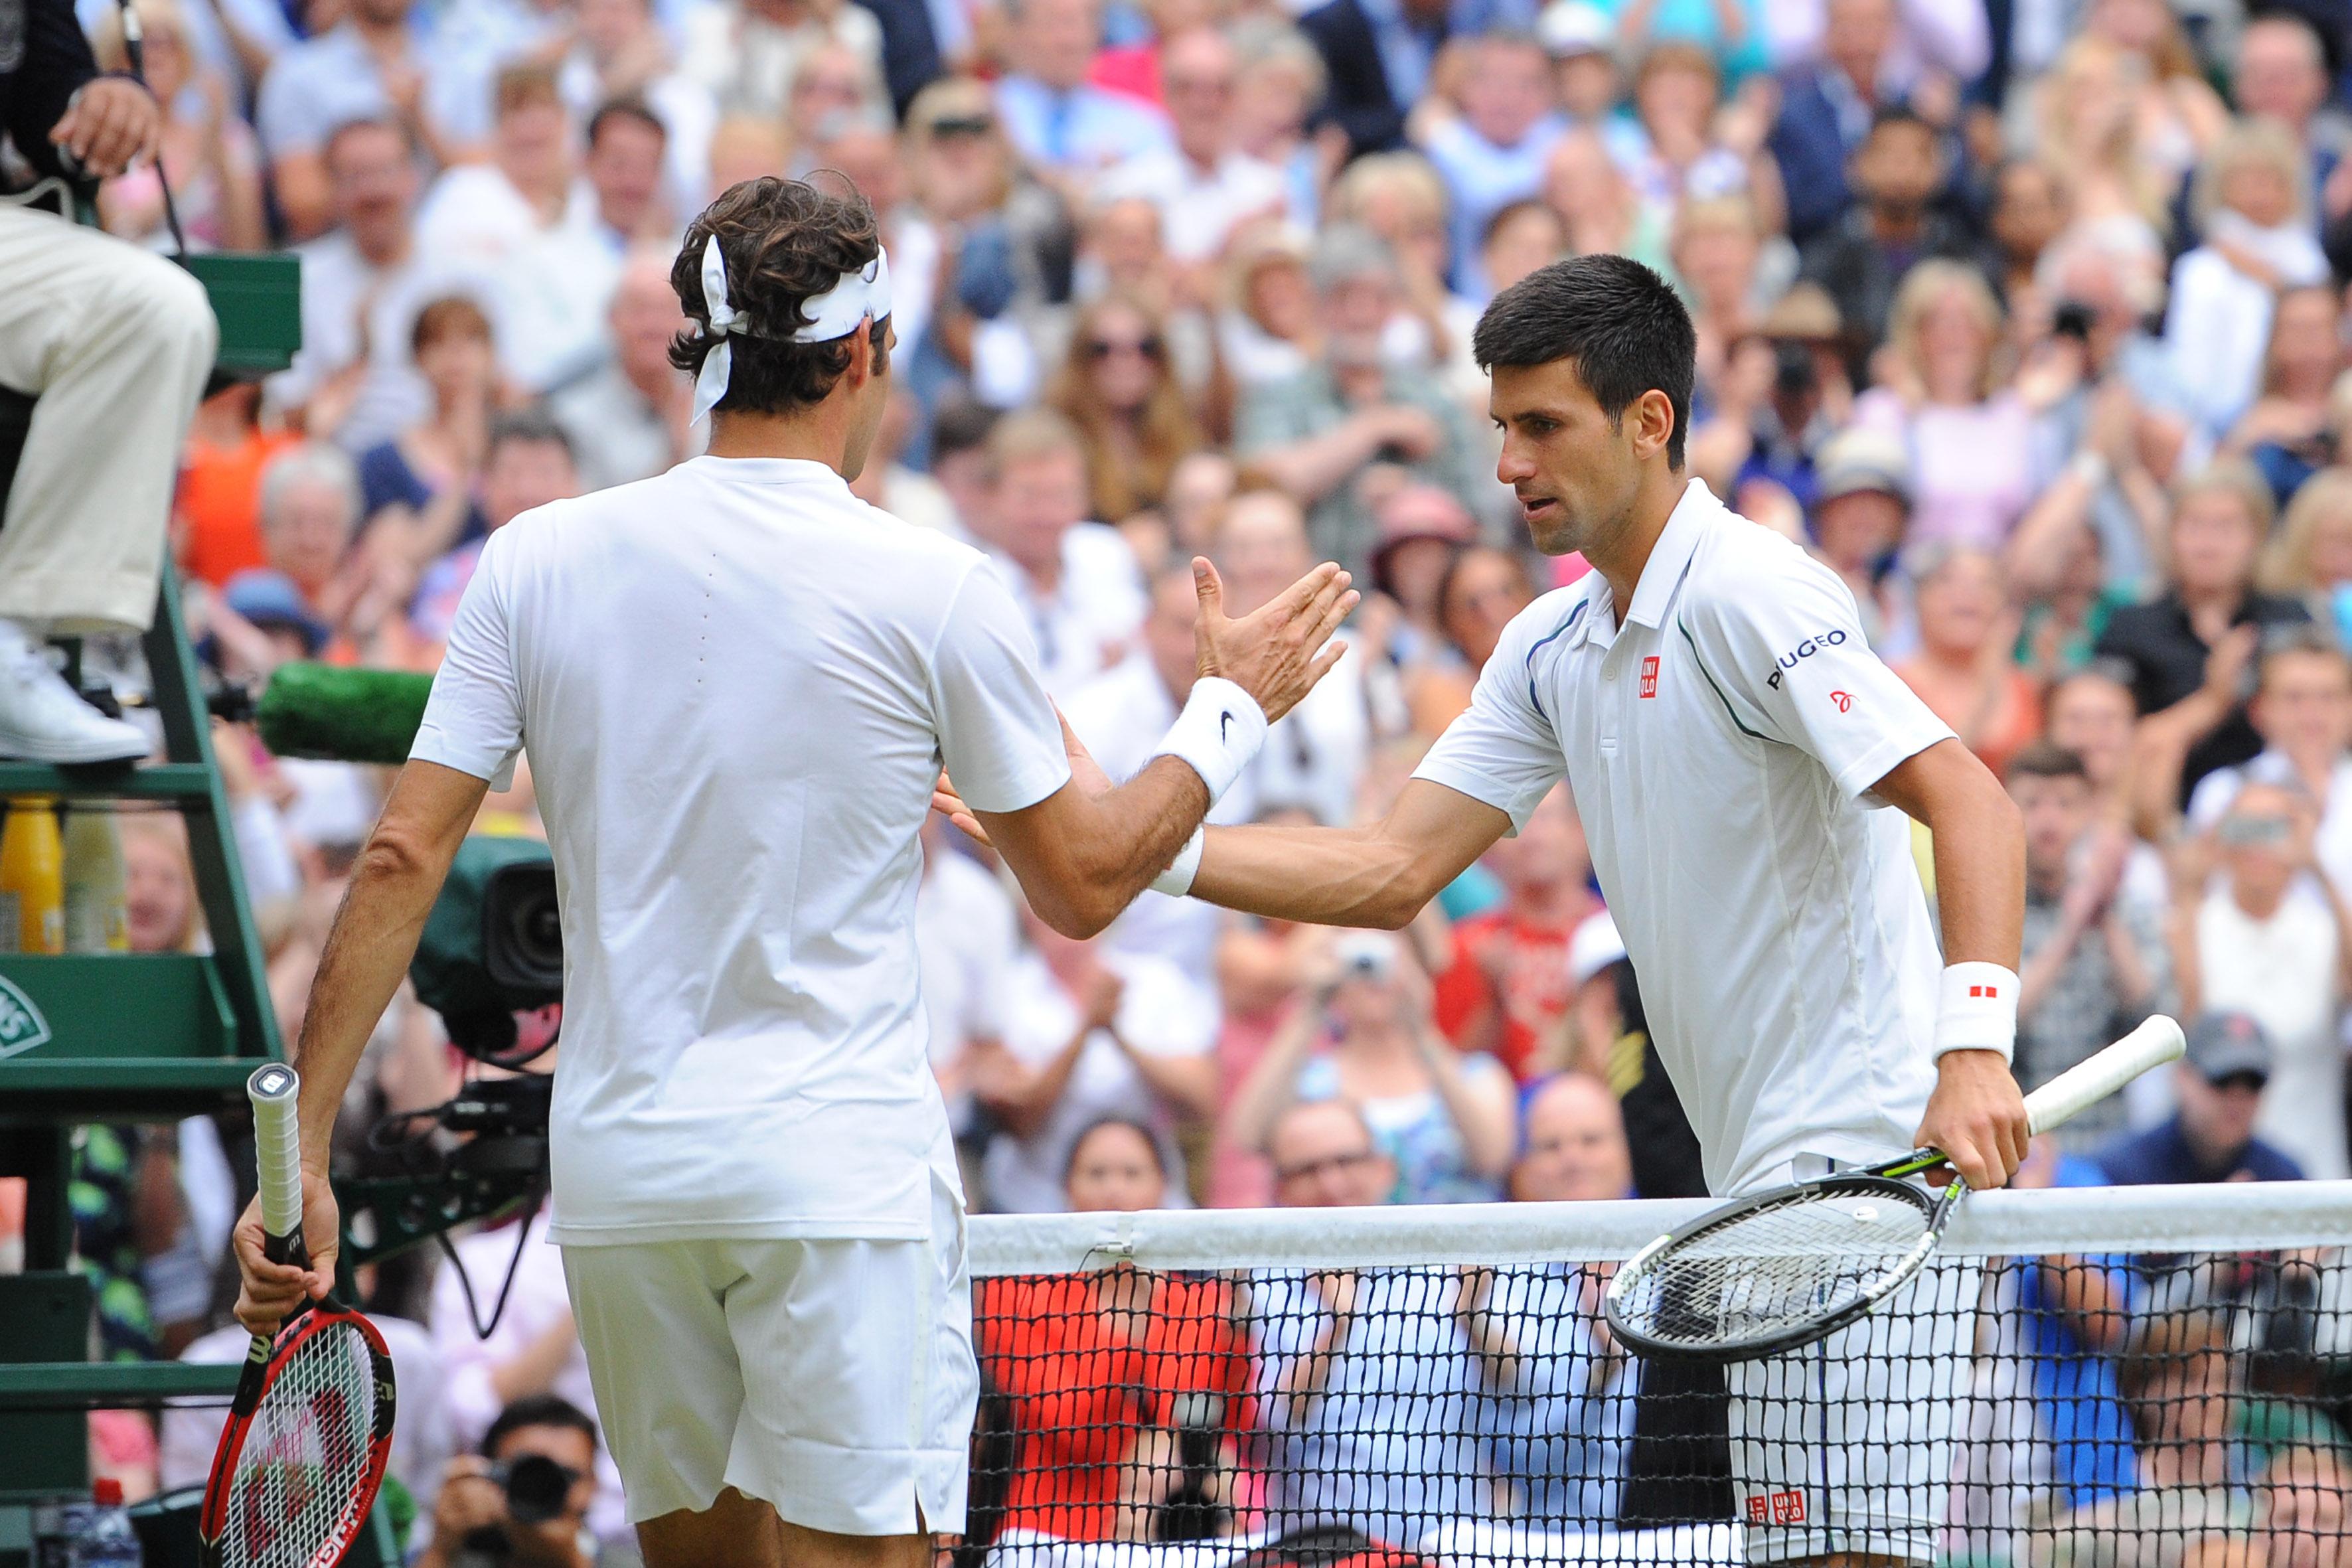 Tennis : Wimbledon - Vers une demi-finale Djokovic-Federer � Wimbledon ?